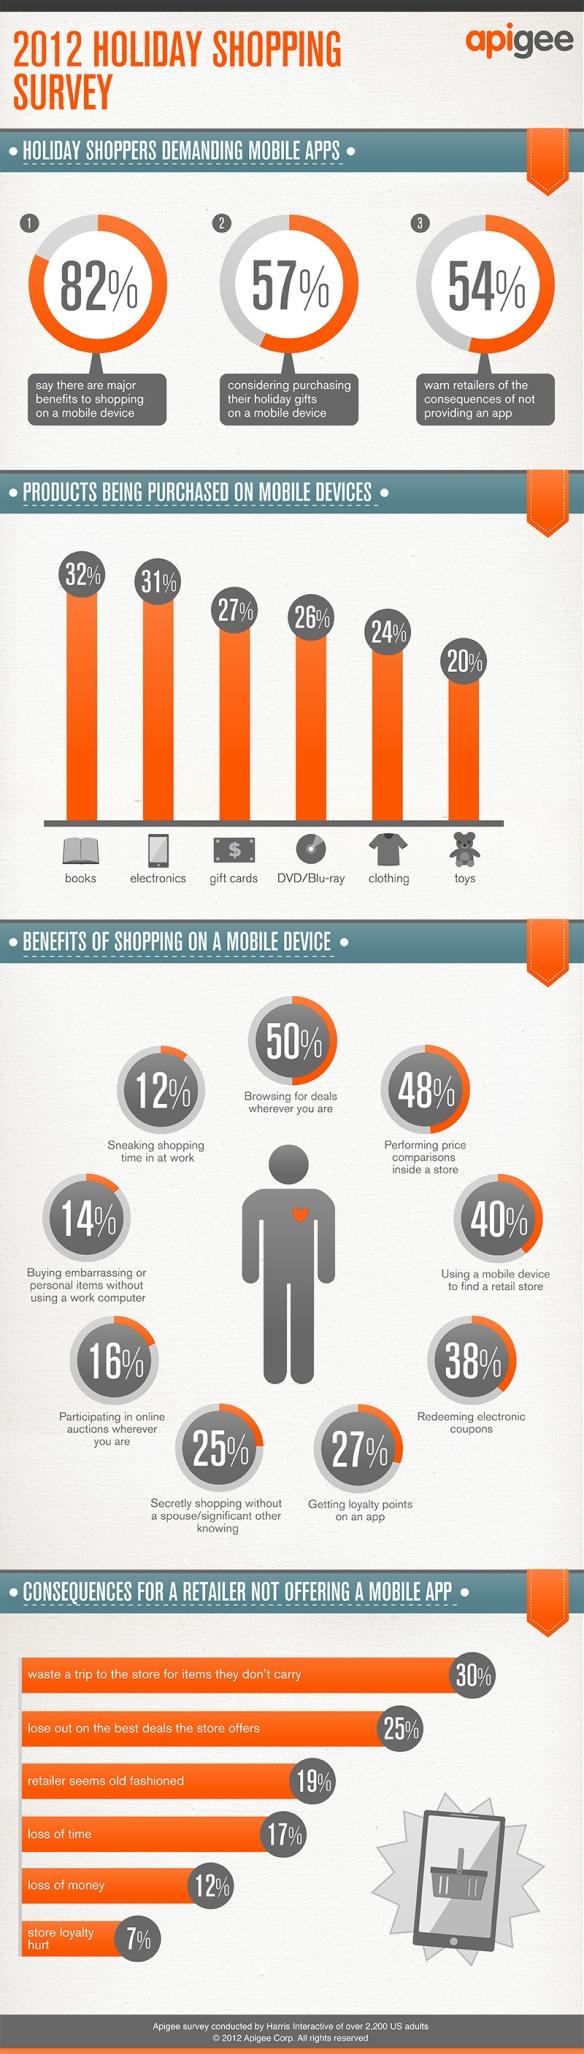 Mobile App Survey results